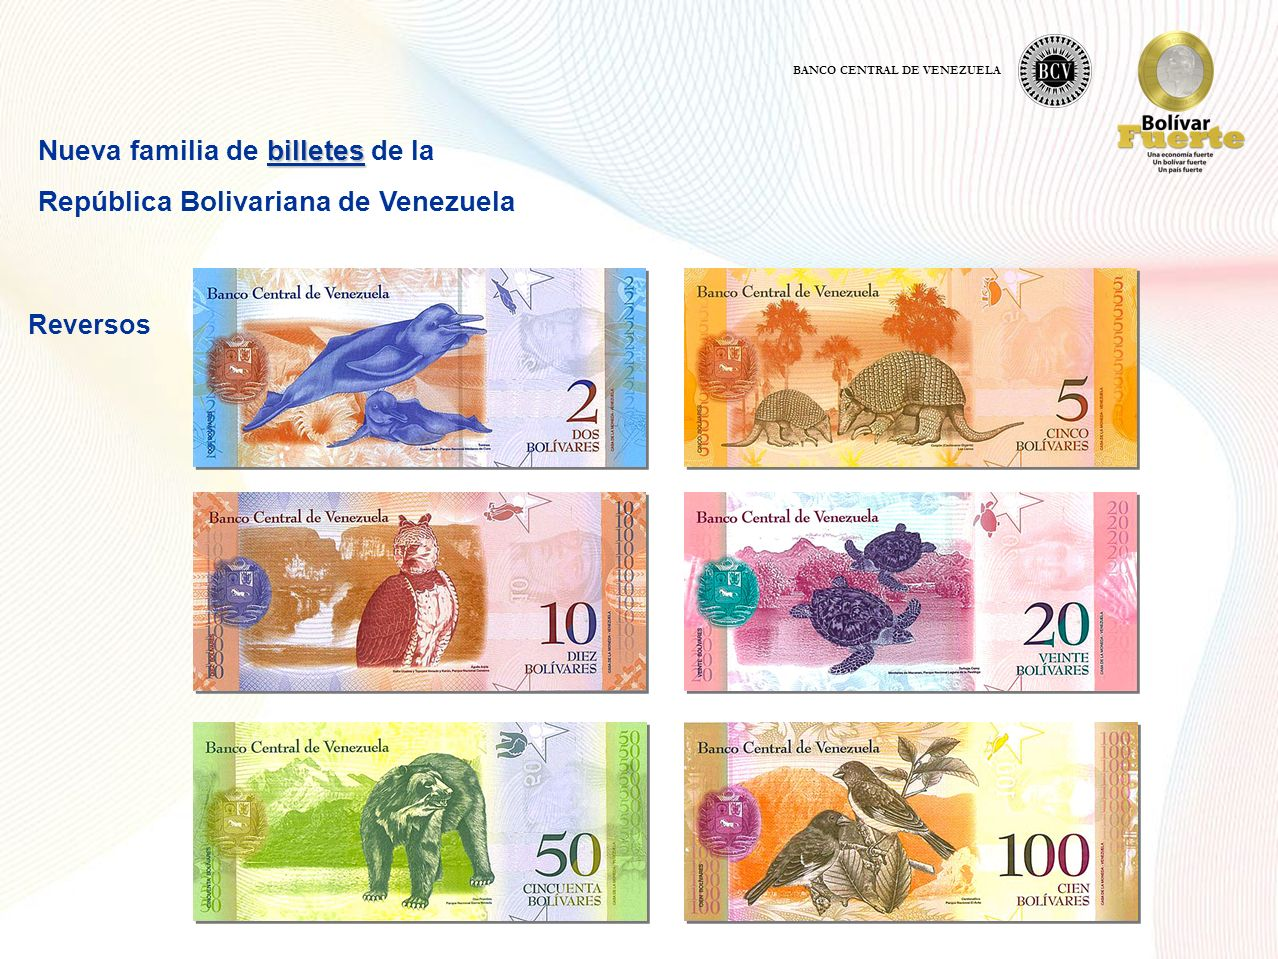 Nueva familia de billetes de la República Bolivariana de Venezuela